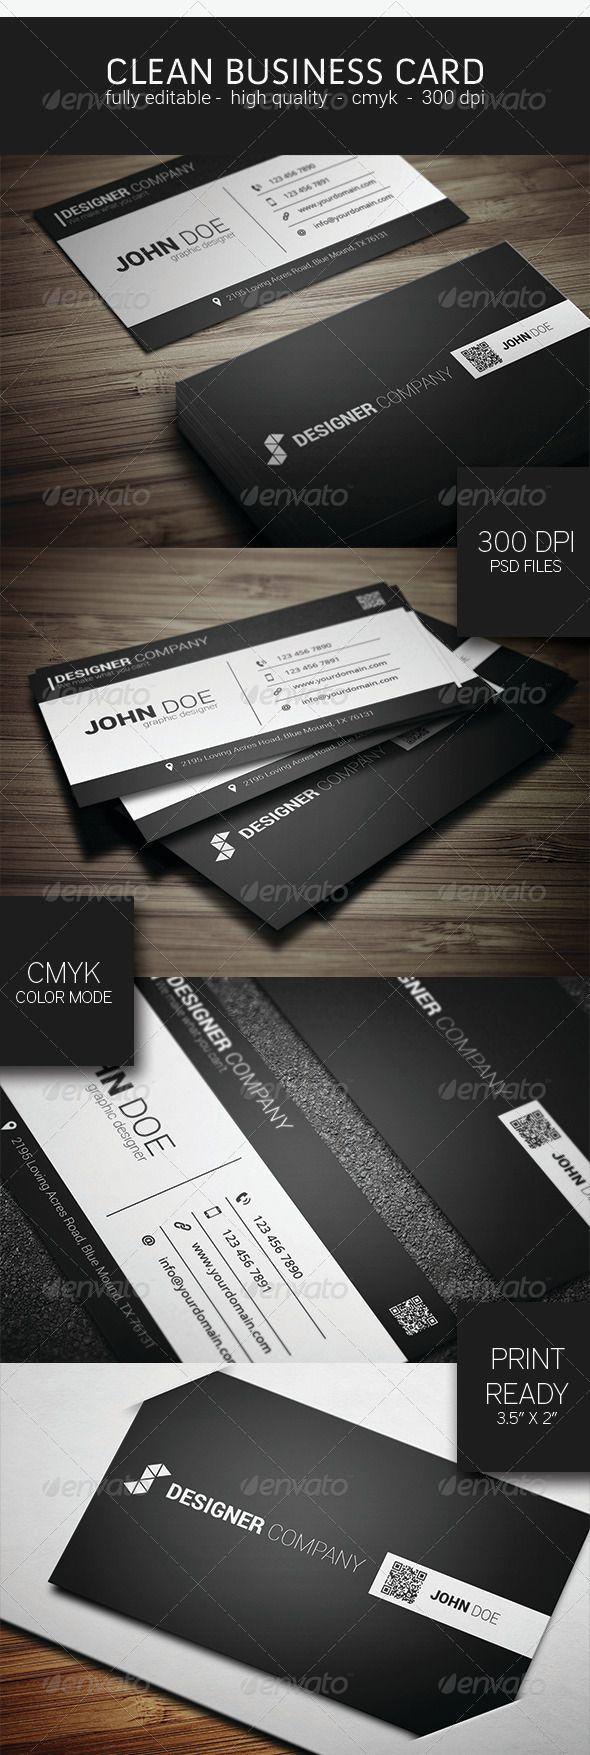 Famous Analrapist Business Card Images - Business Card Ideas ...